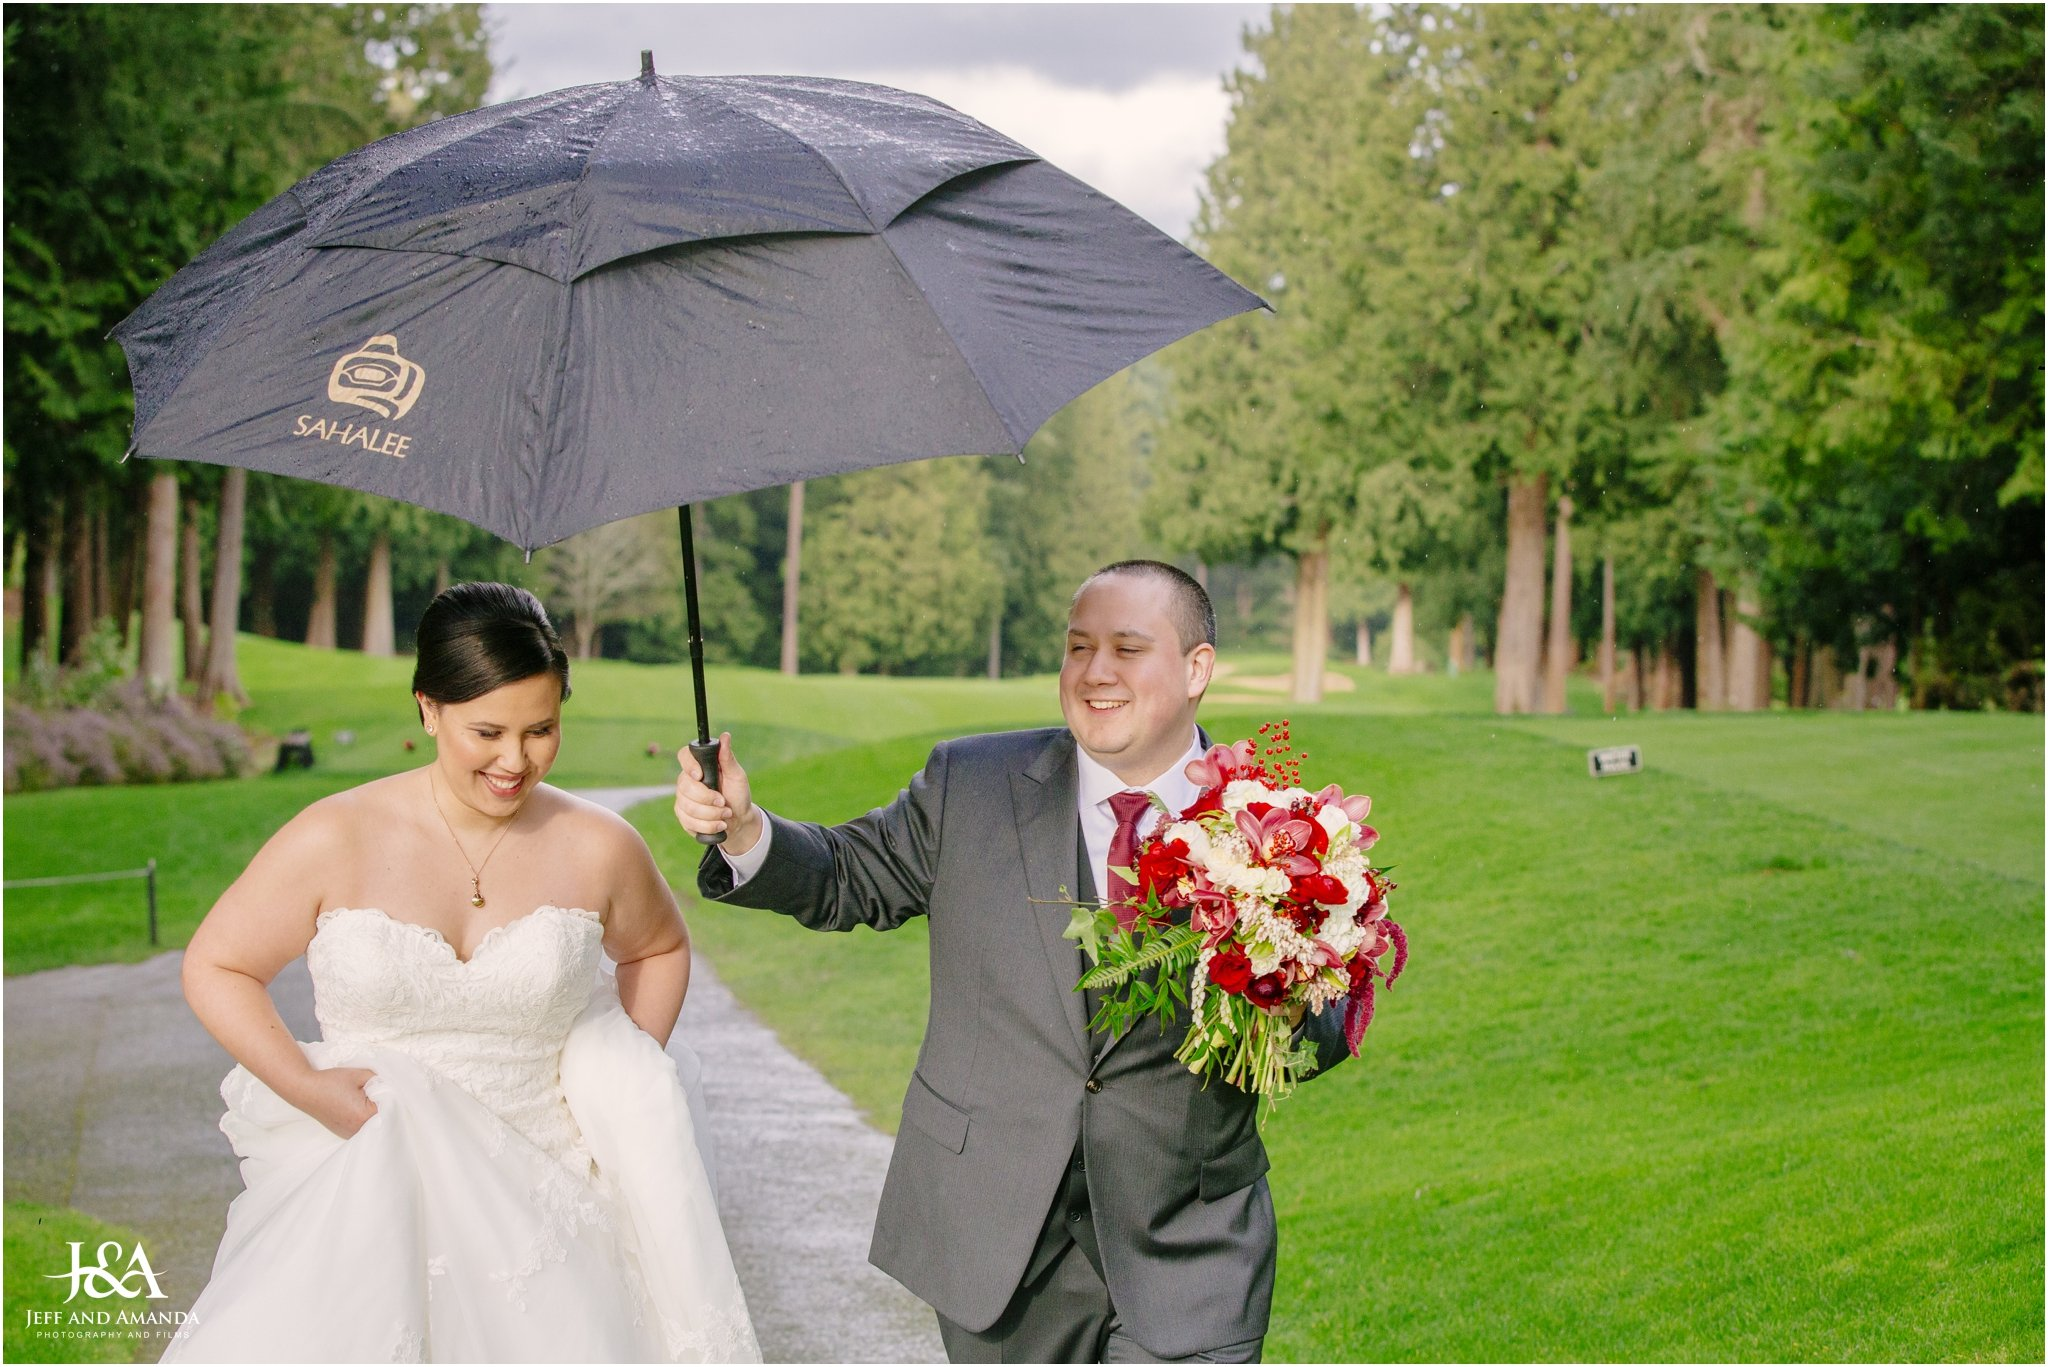 Dave and Kari s Wedding-Facebook Ready-0188.jpg